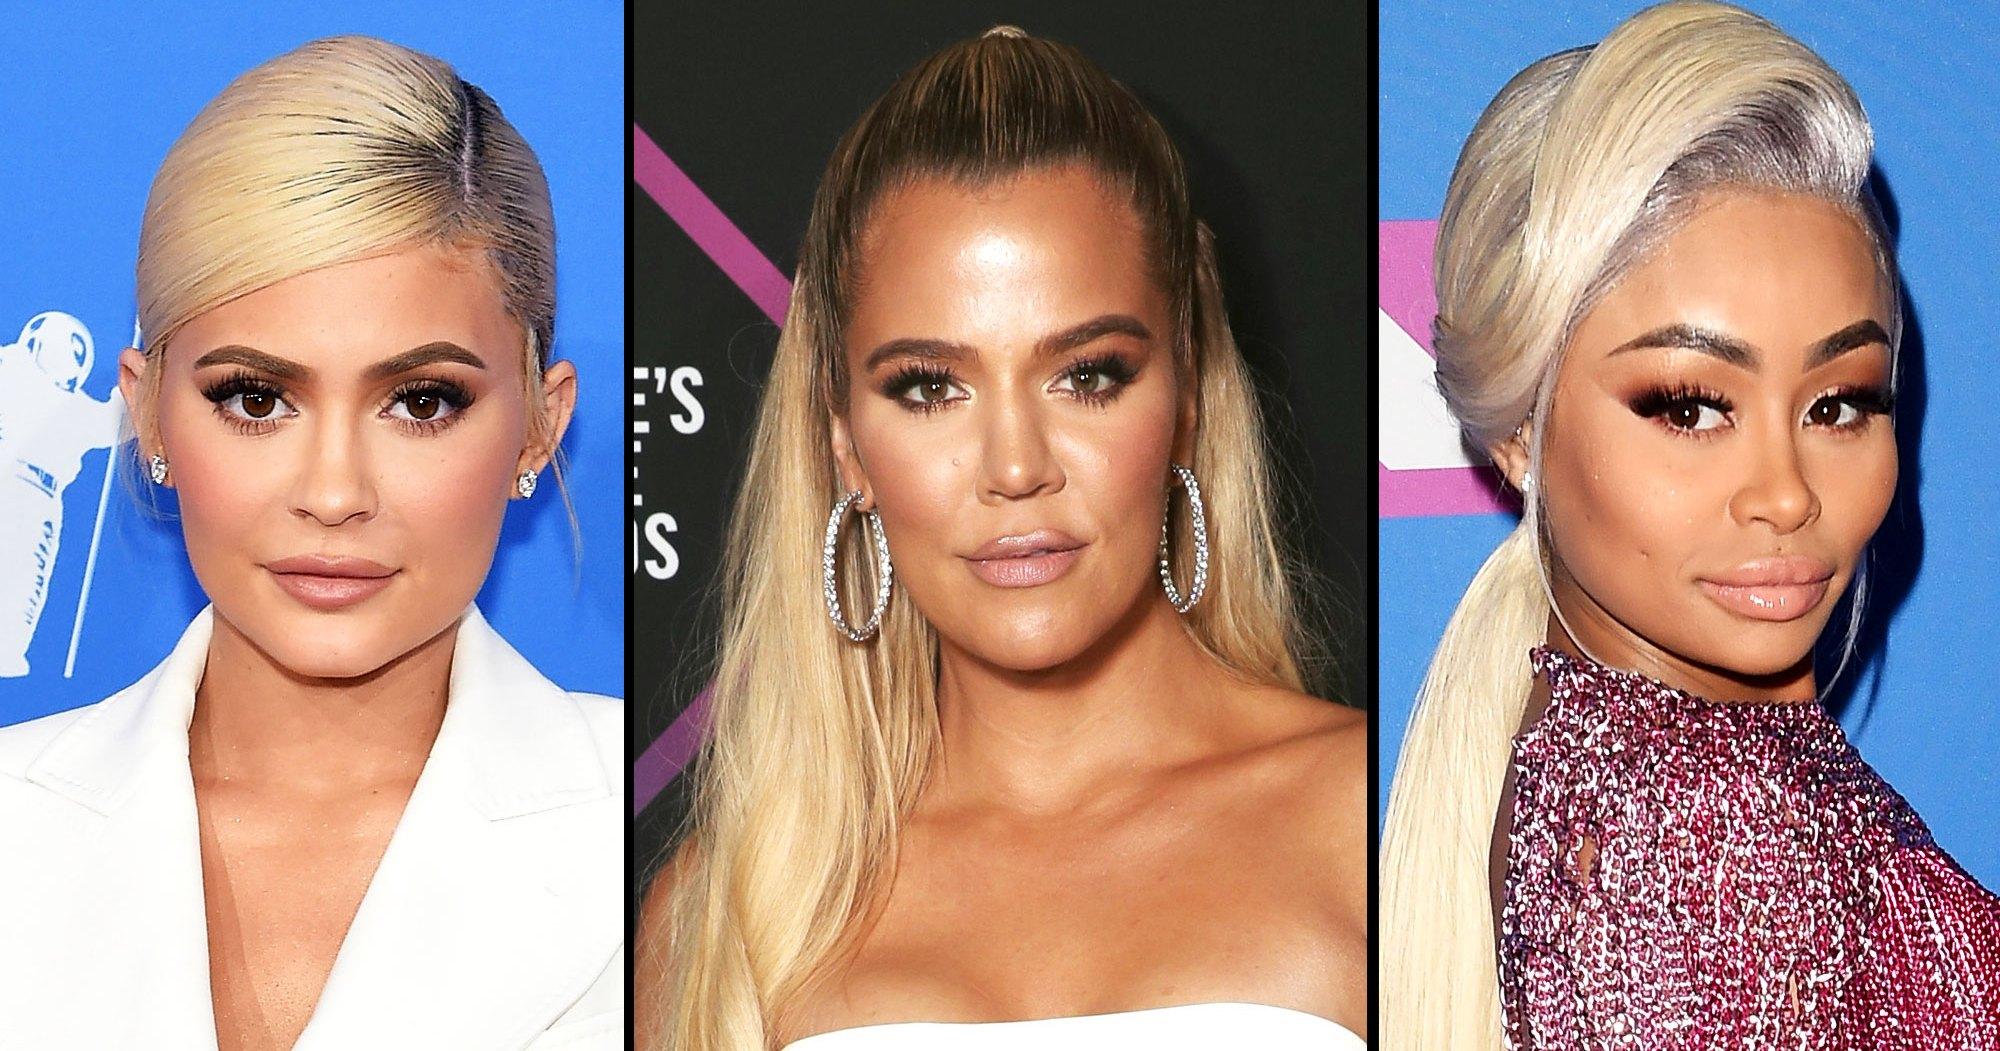 Kylie Jenner, Khloe Kardashian Considered Ending 'KUWTK' Over 'Toxic' Chyna